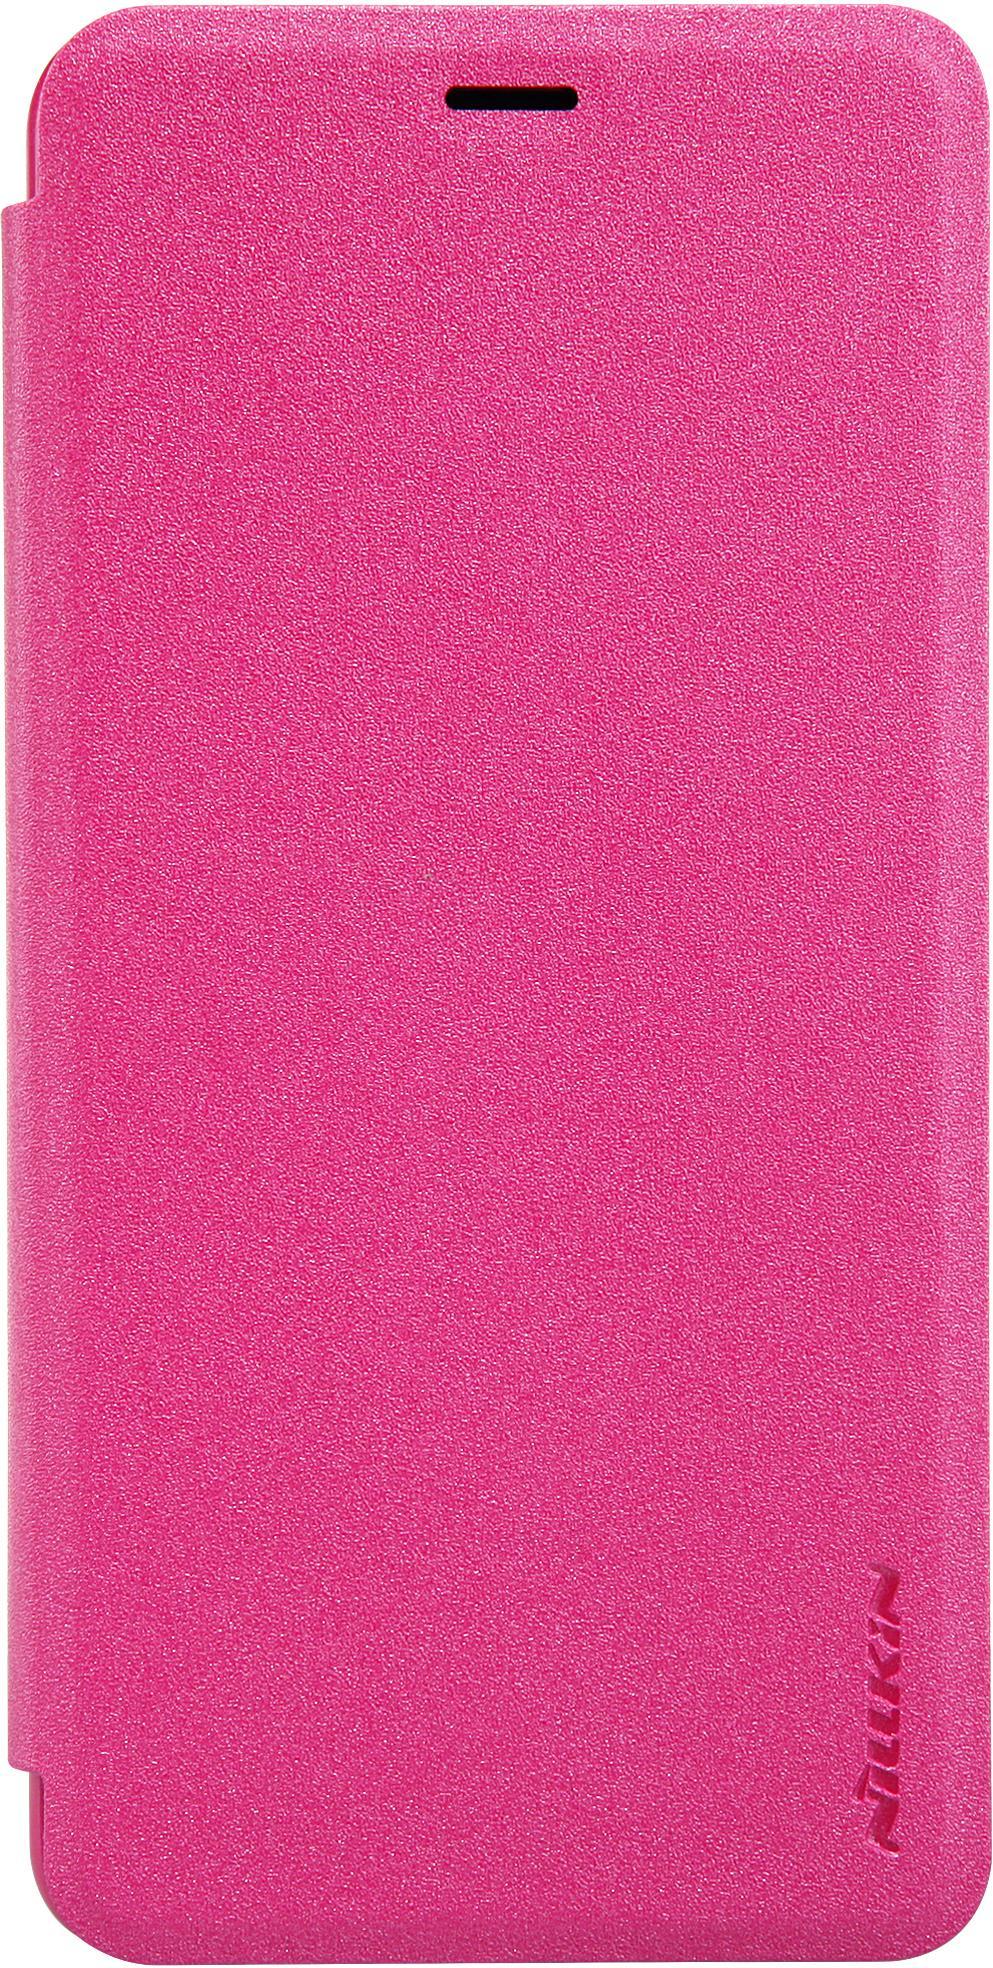 Чехол Nillkin Sparkle для Meizu M5, 6902048133587, розовый чехол для meizu m5 gecko flip белый